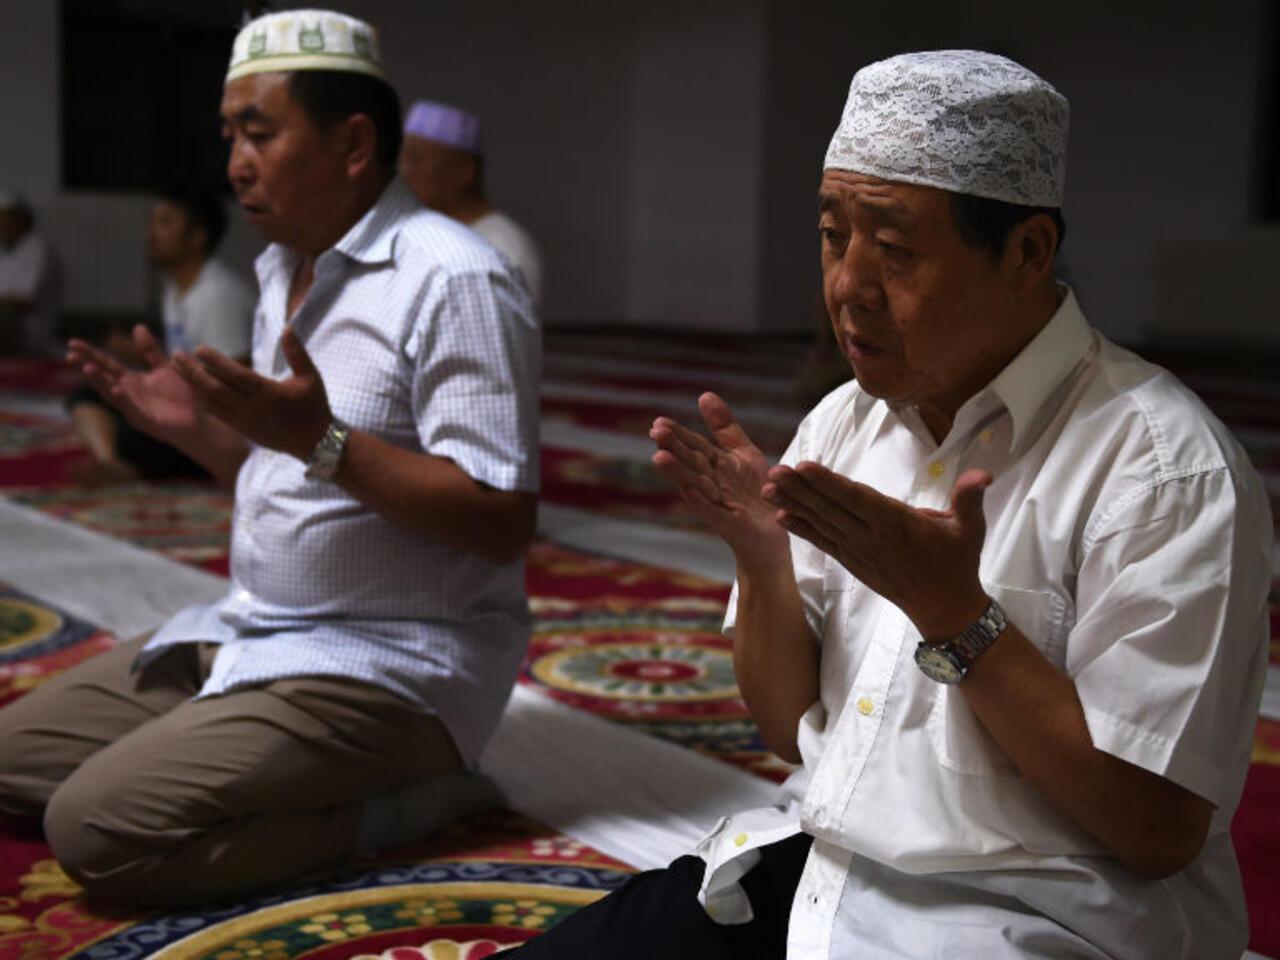 Ramadan en Chine : Pékin dicte ses règles aux musulmans du Xinjiang